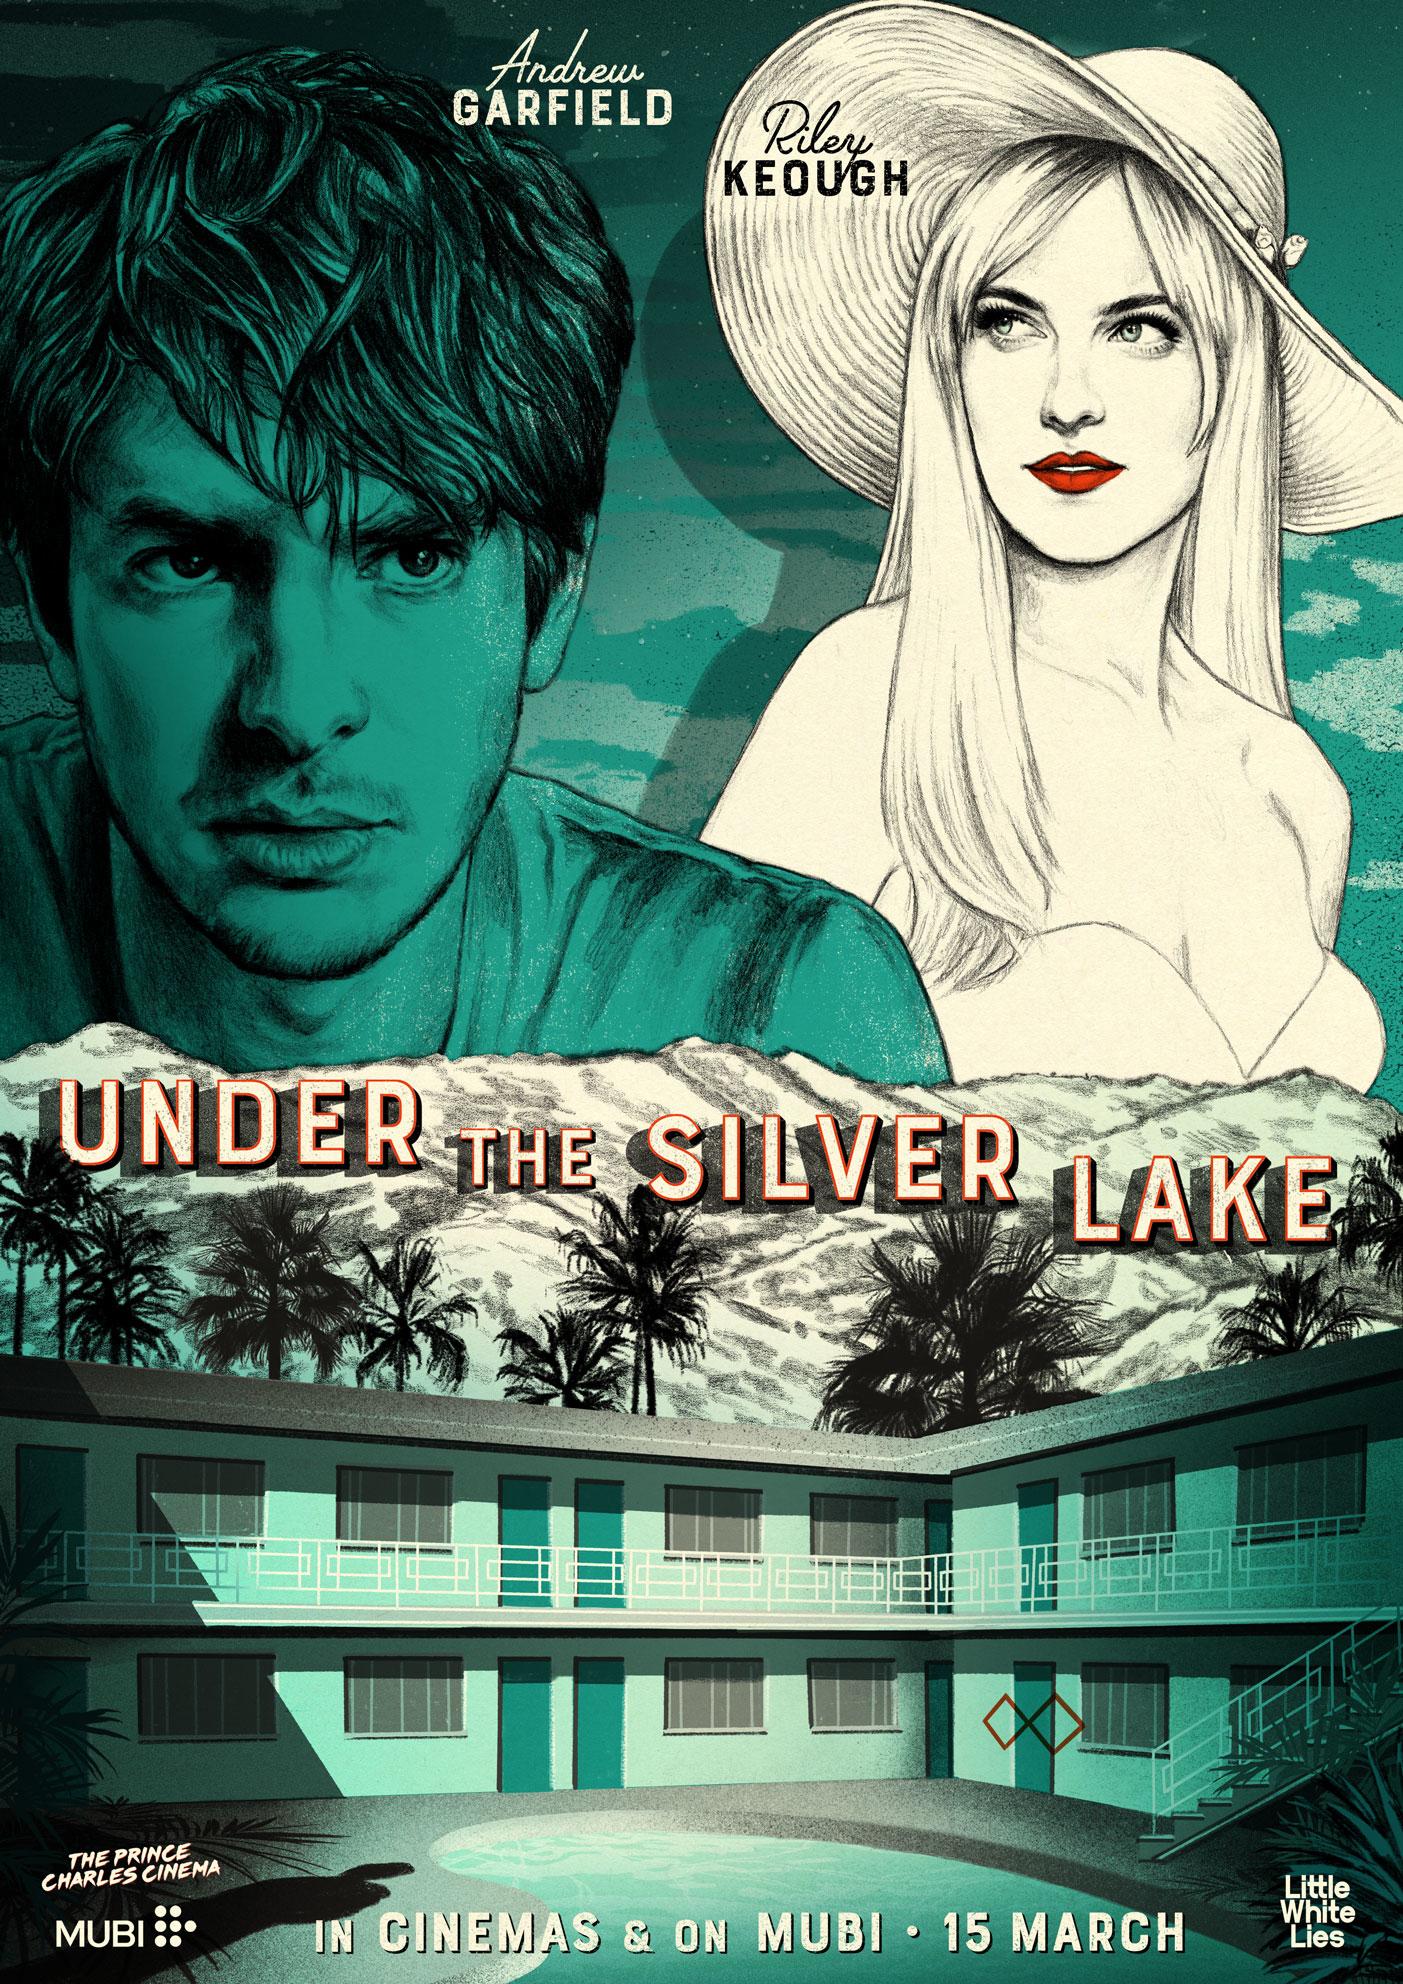 Under-the-silver-lake-Andrew-Garfield-jennifer-dionisio-jen-illustration-artwork-alternative-movie-poster-film-neo-noir-vintage.jpg